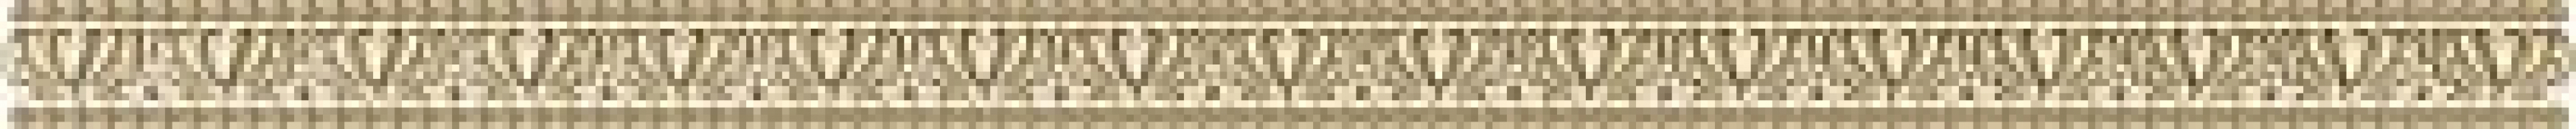 Бордюр настенный AltaCera Elite/Touch Marvie 3x60